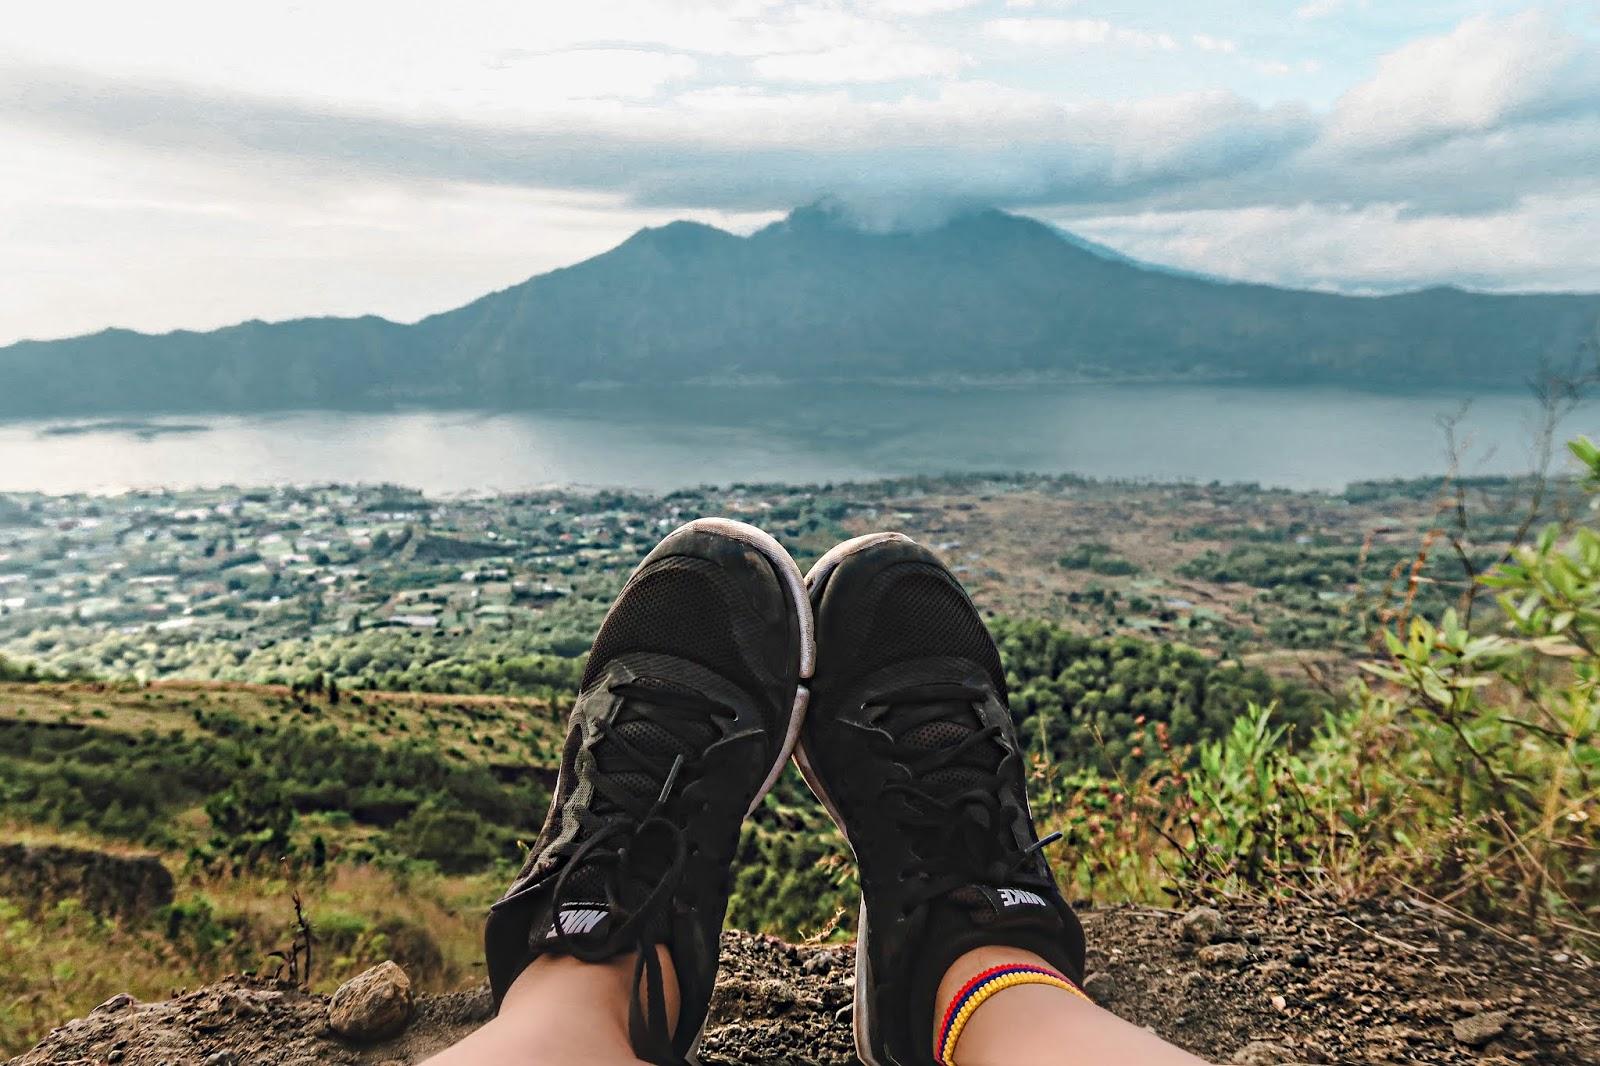 Sunrise Hike Mt Batur Bali Indonesia